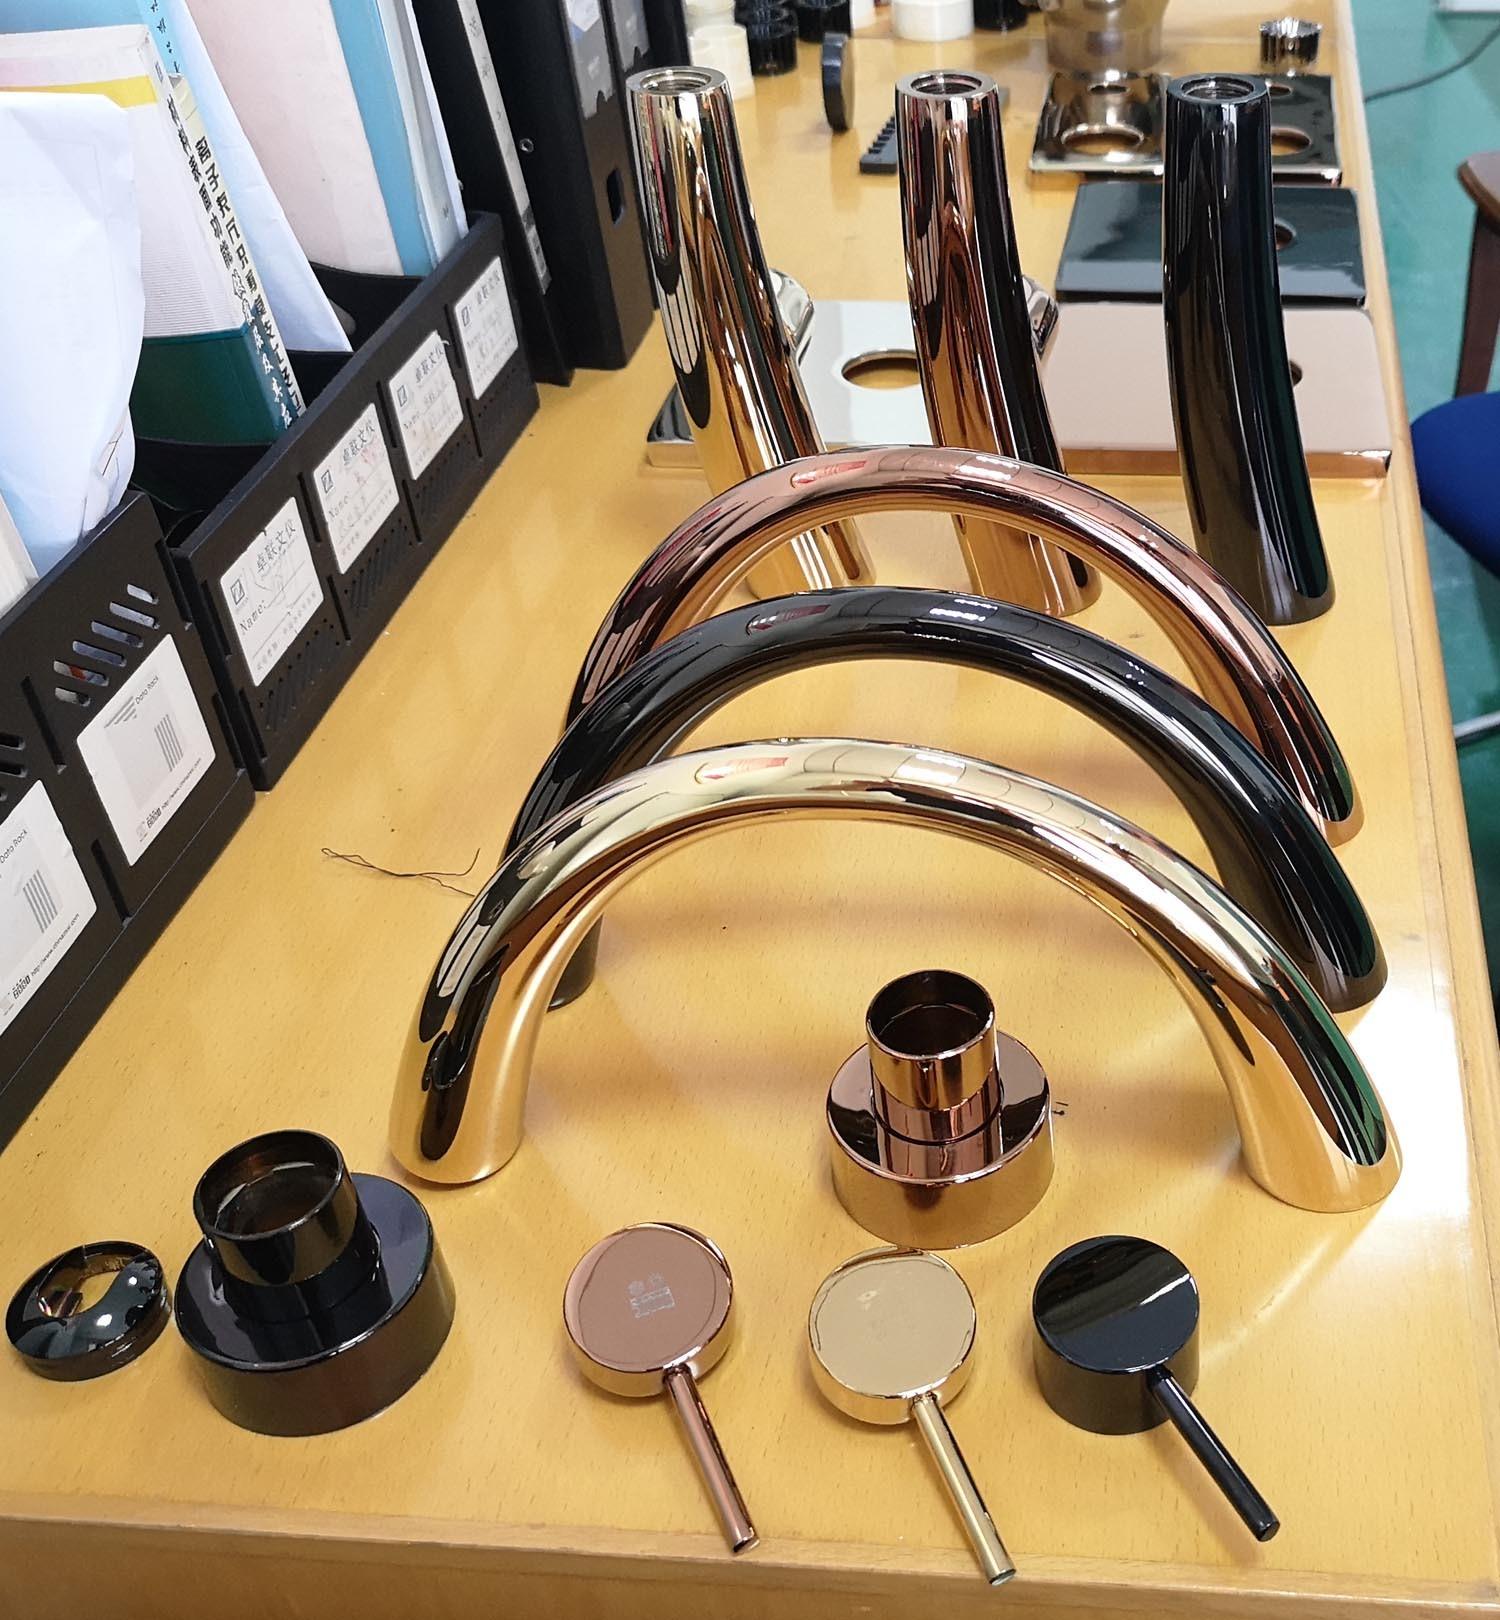 House Wares Cathodic Arc Deposition System, Industrial Vacuum Plating Equipment